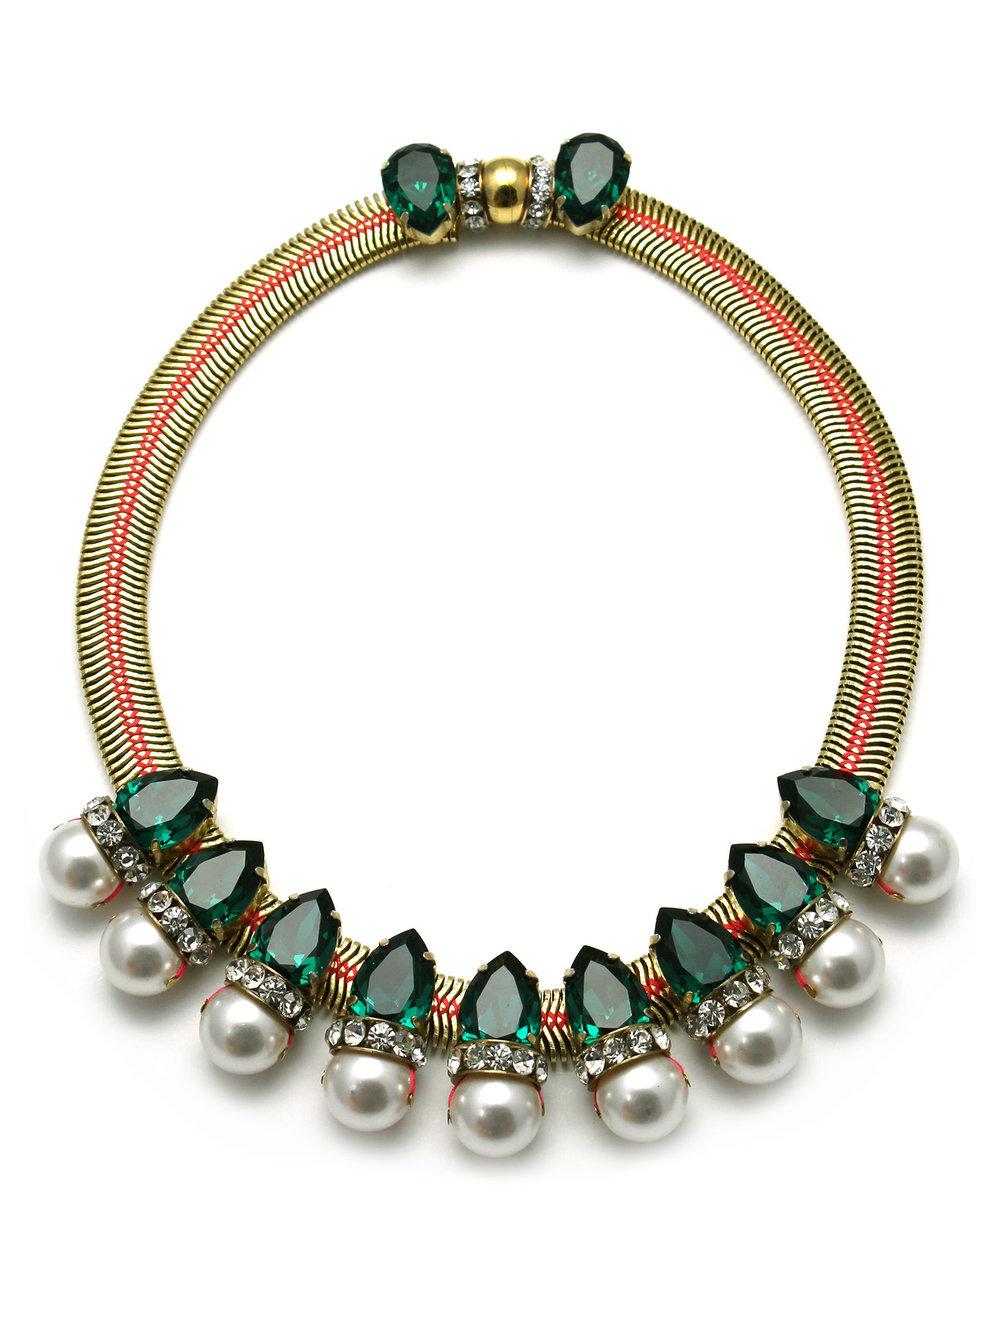 171N-GWP Aragon Necklace - Green_White.jpg